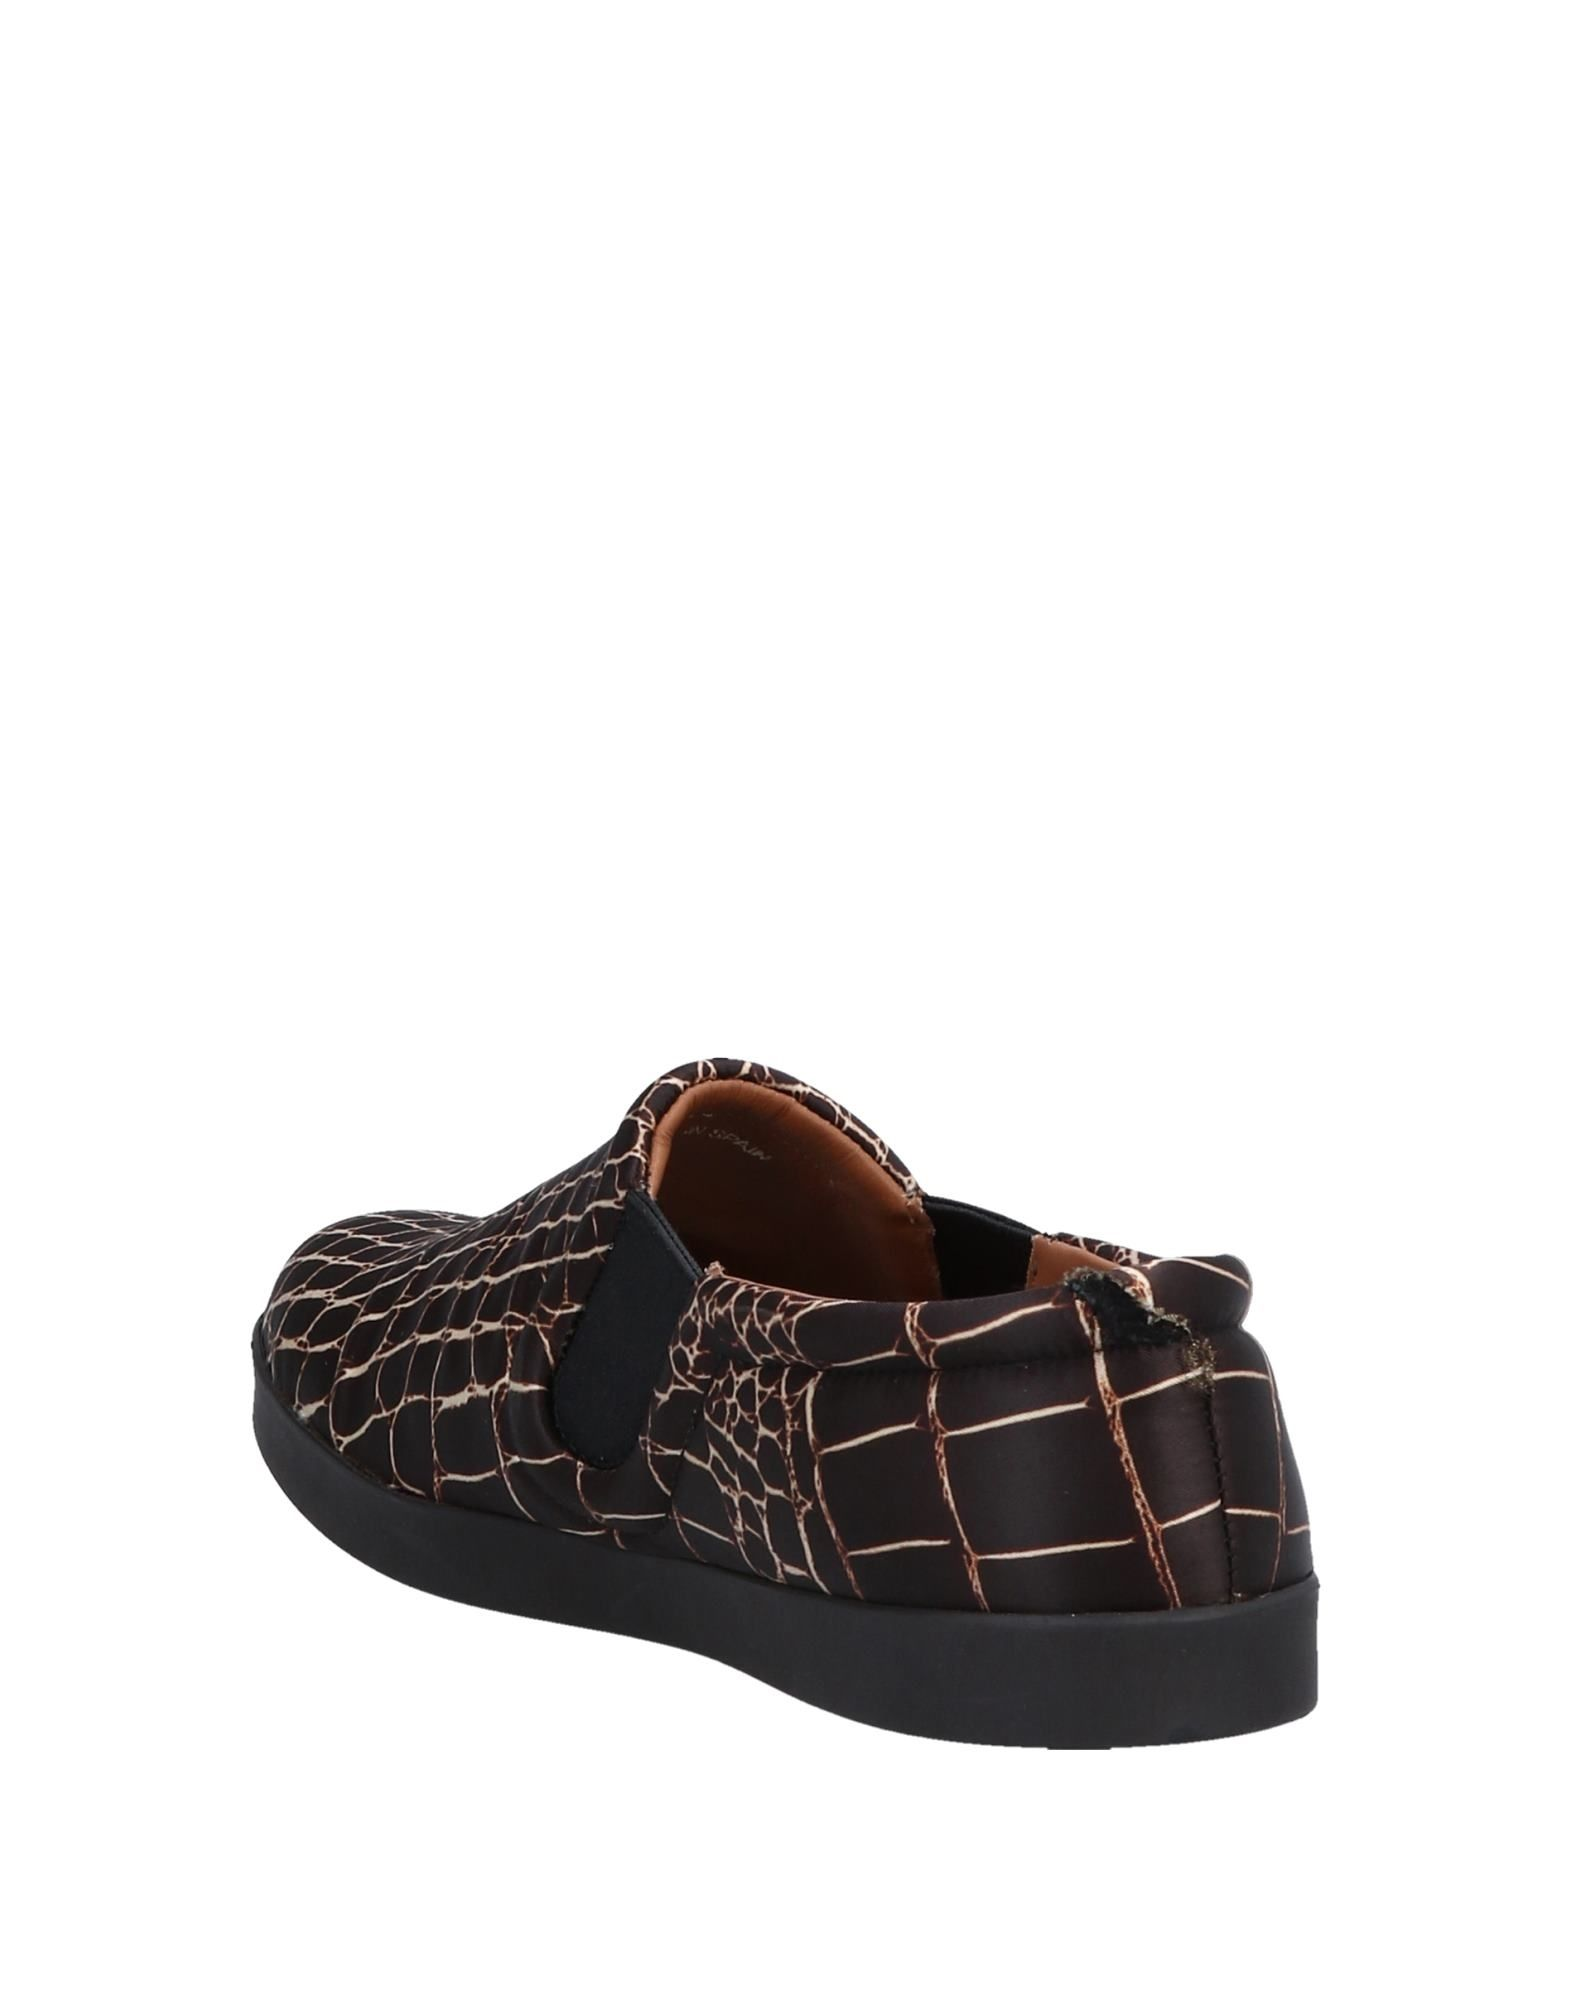 Stilvolle Sneakers billige Schuhe Emporio Armani Sneakers Stilvolle Damen  11570684CC c14d5c